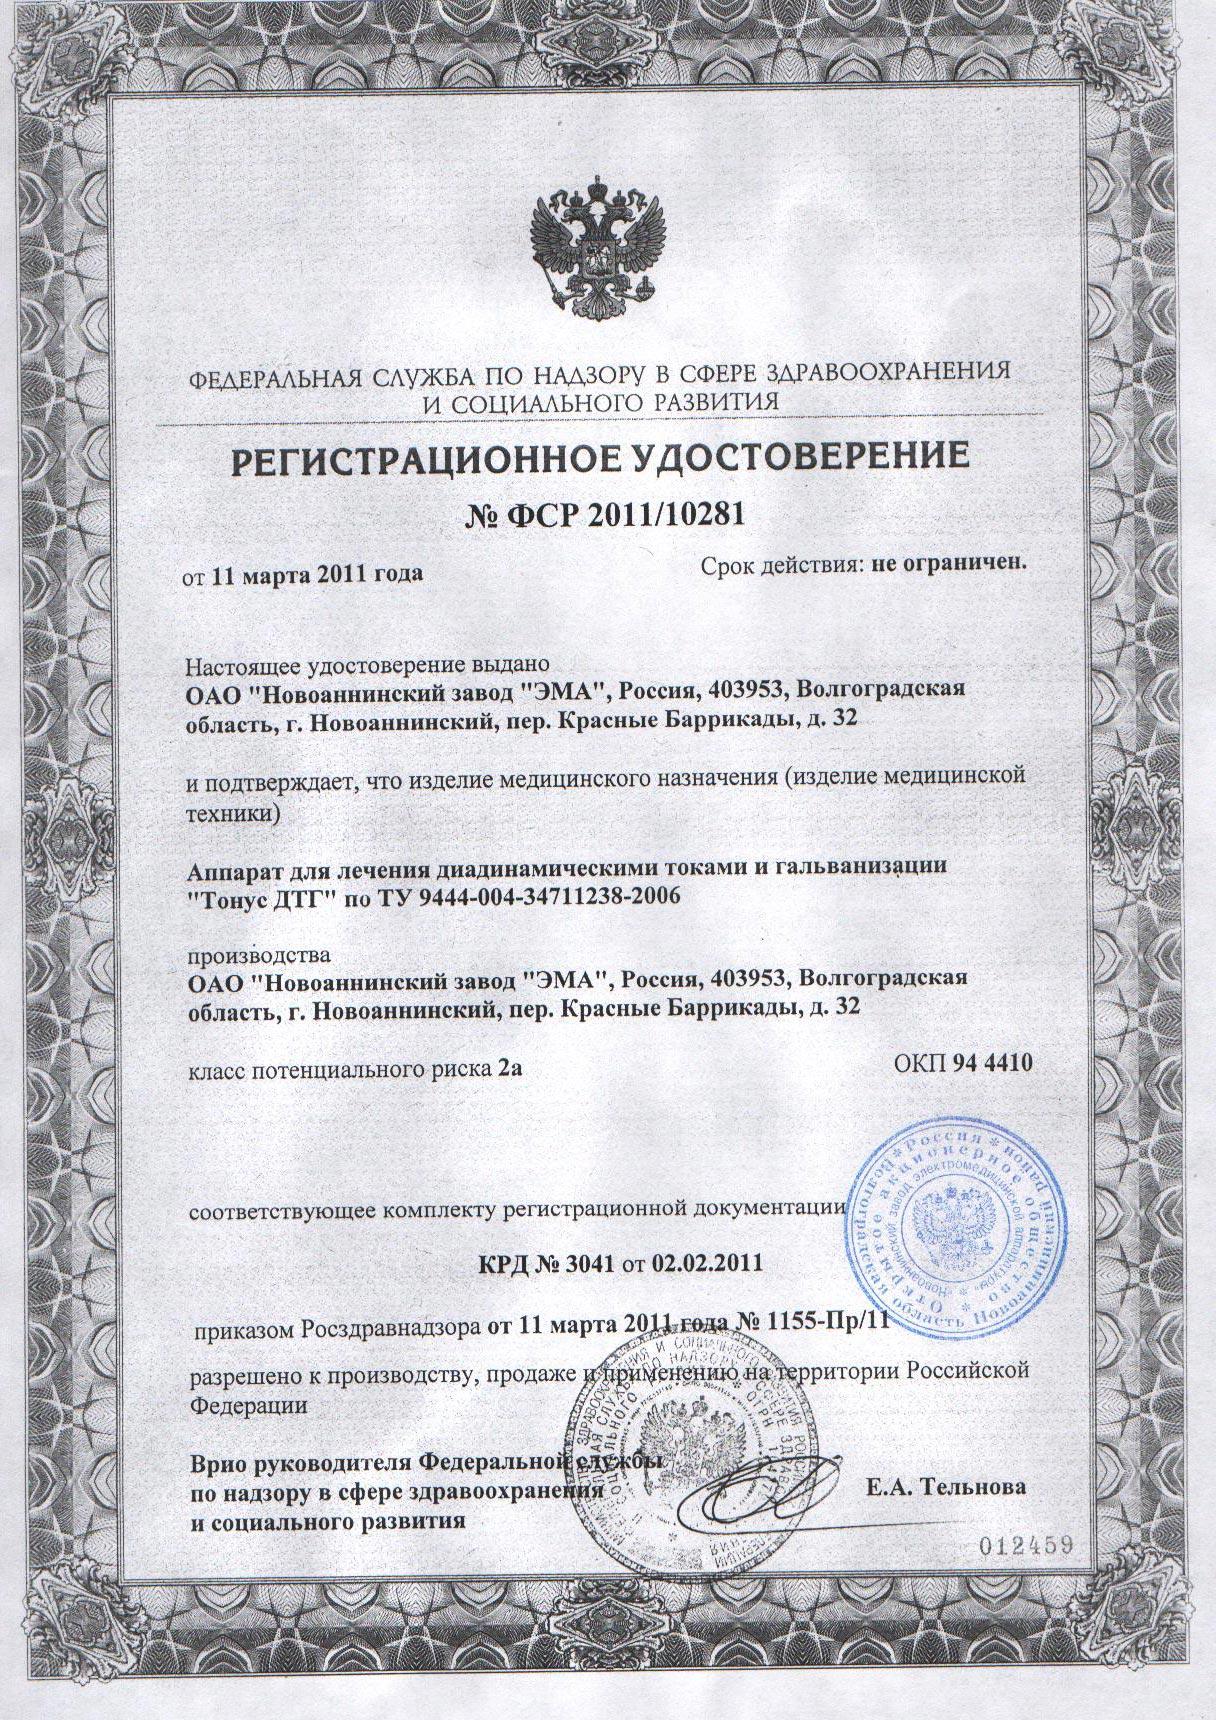 сертификат ТОНУС ДТГ - аппарат для лечения диадинамическими токами